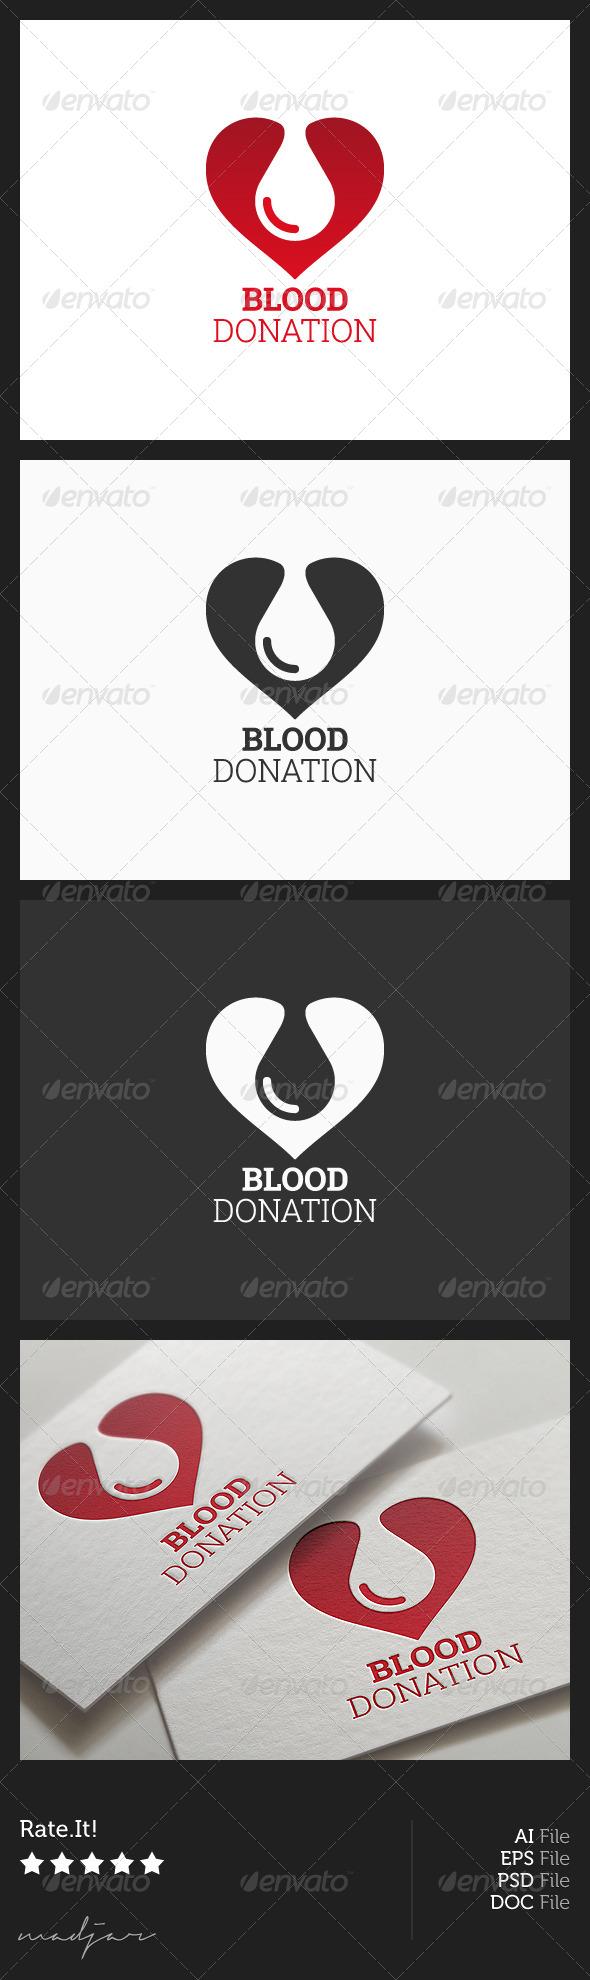 Blood Donation Logo - Objects Logo Templates